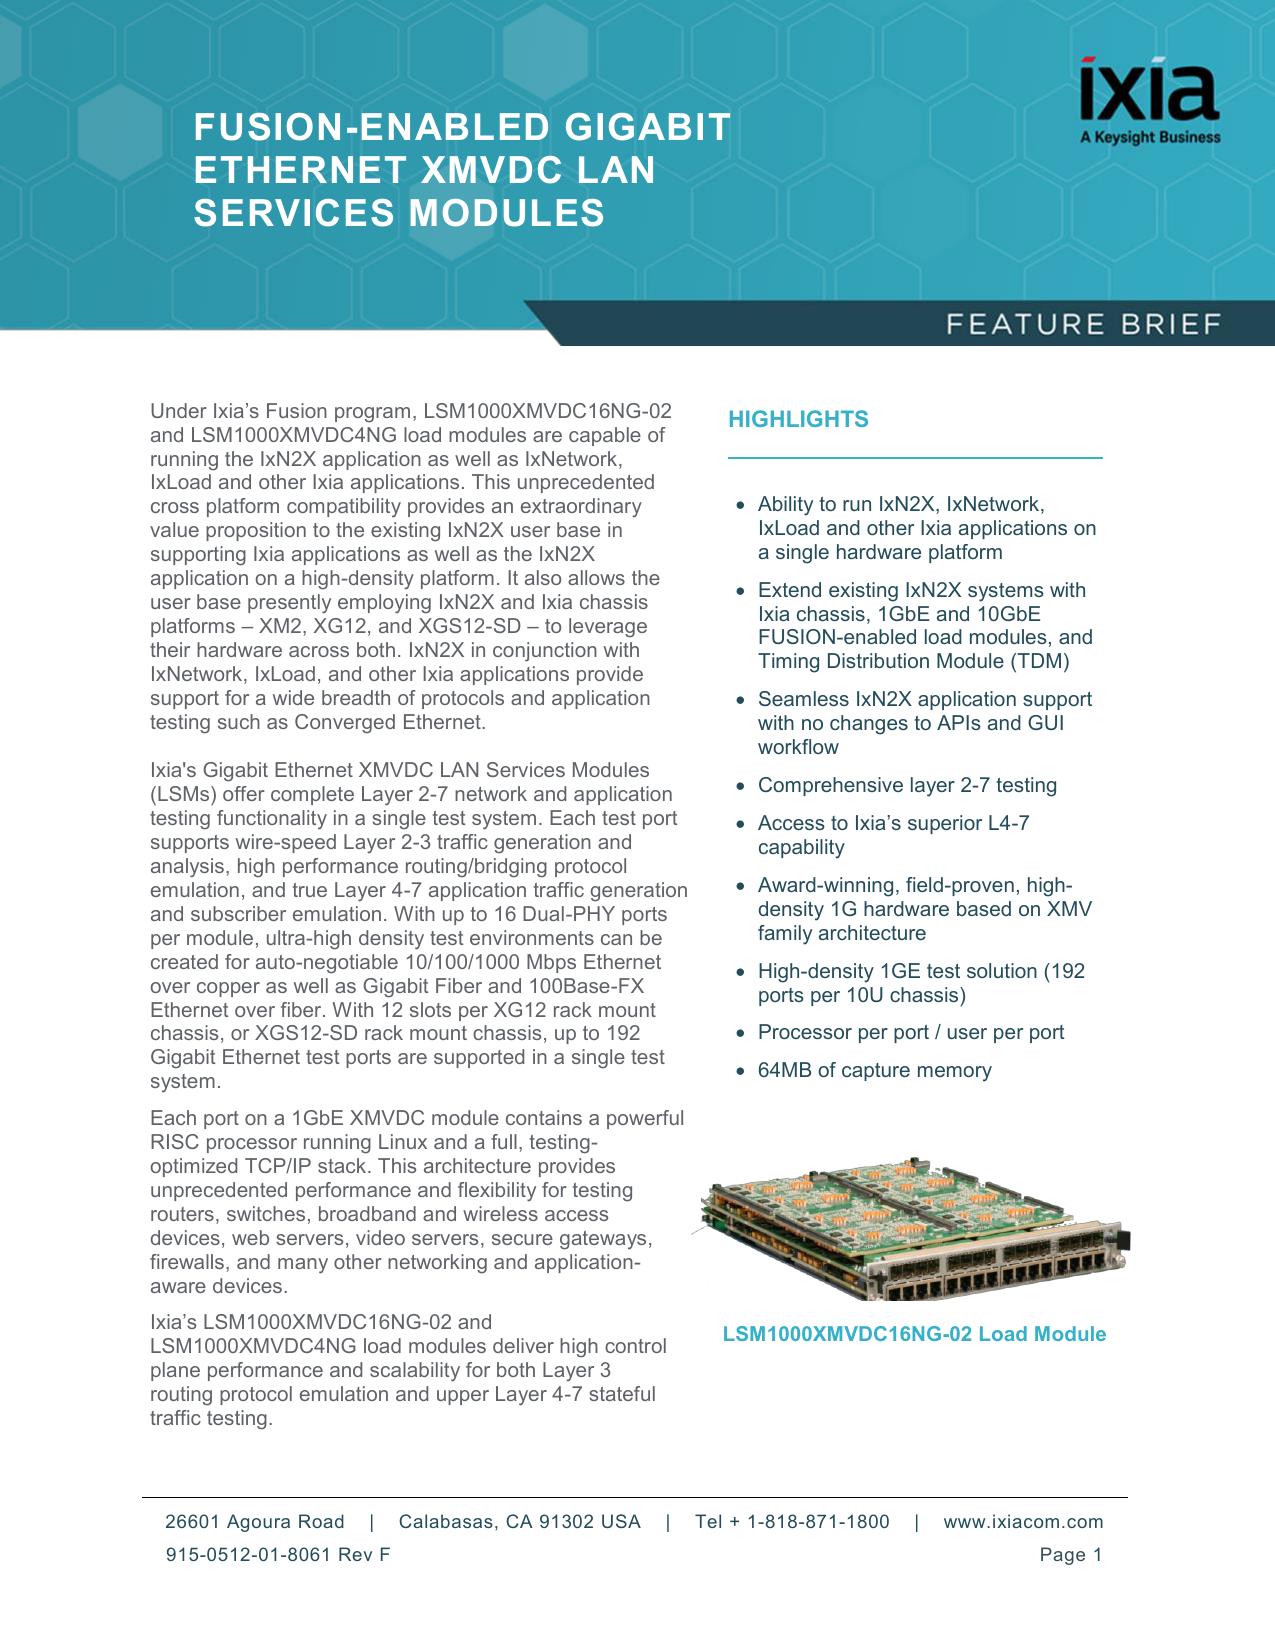 fusion-enabled gigabit ethernet xmvdc lan services modules